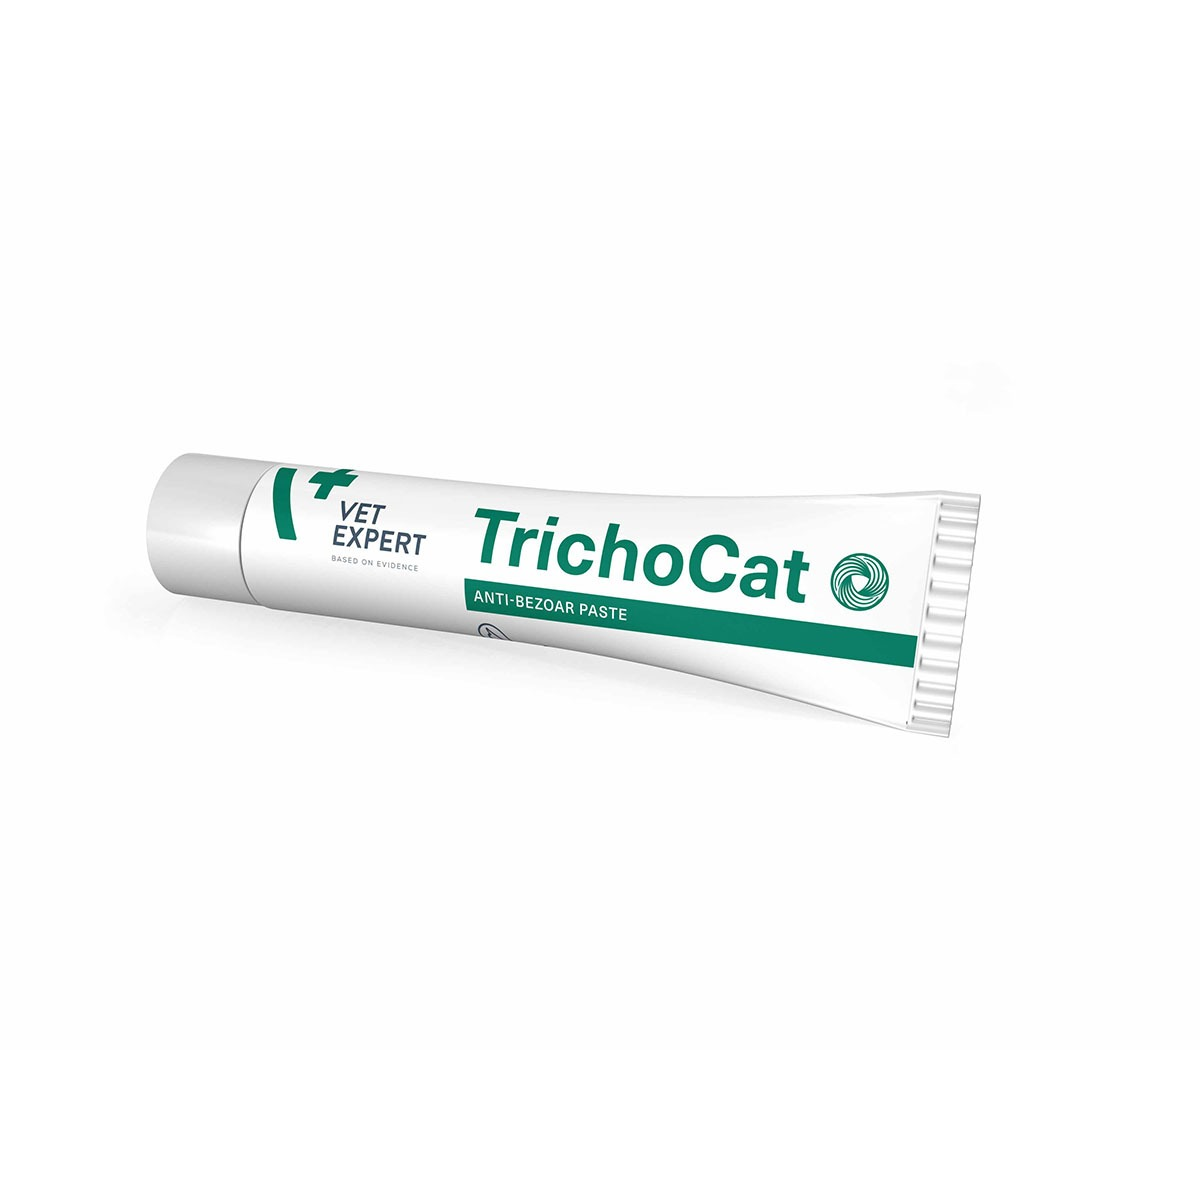 VetExpert TrichoCat Anti-bezoar Paste 120g Diätergänzungsfuttermittel Tierarztbedarf, Veterinärbedarf, Veterinärmedizin, Praxisbedarf, Ergänzungsfuttermittel, Tierarztprodukten, Tierapotheke, Tierpflegeprodukte